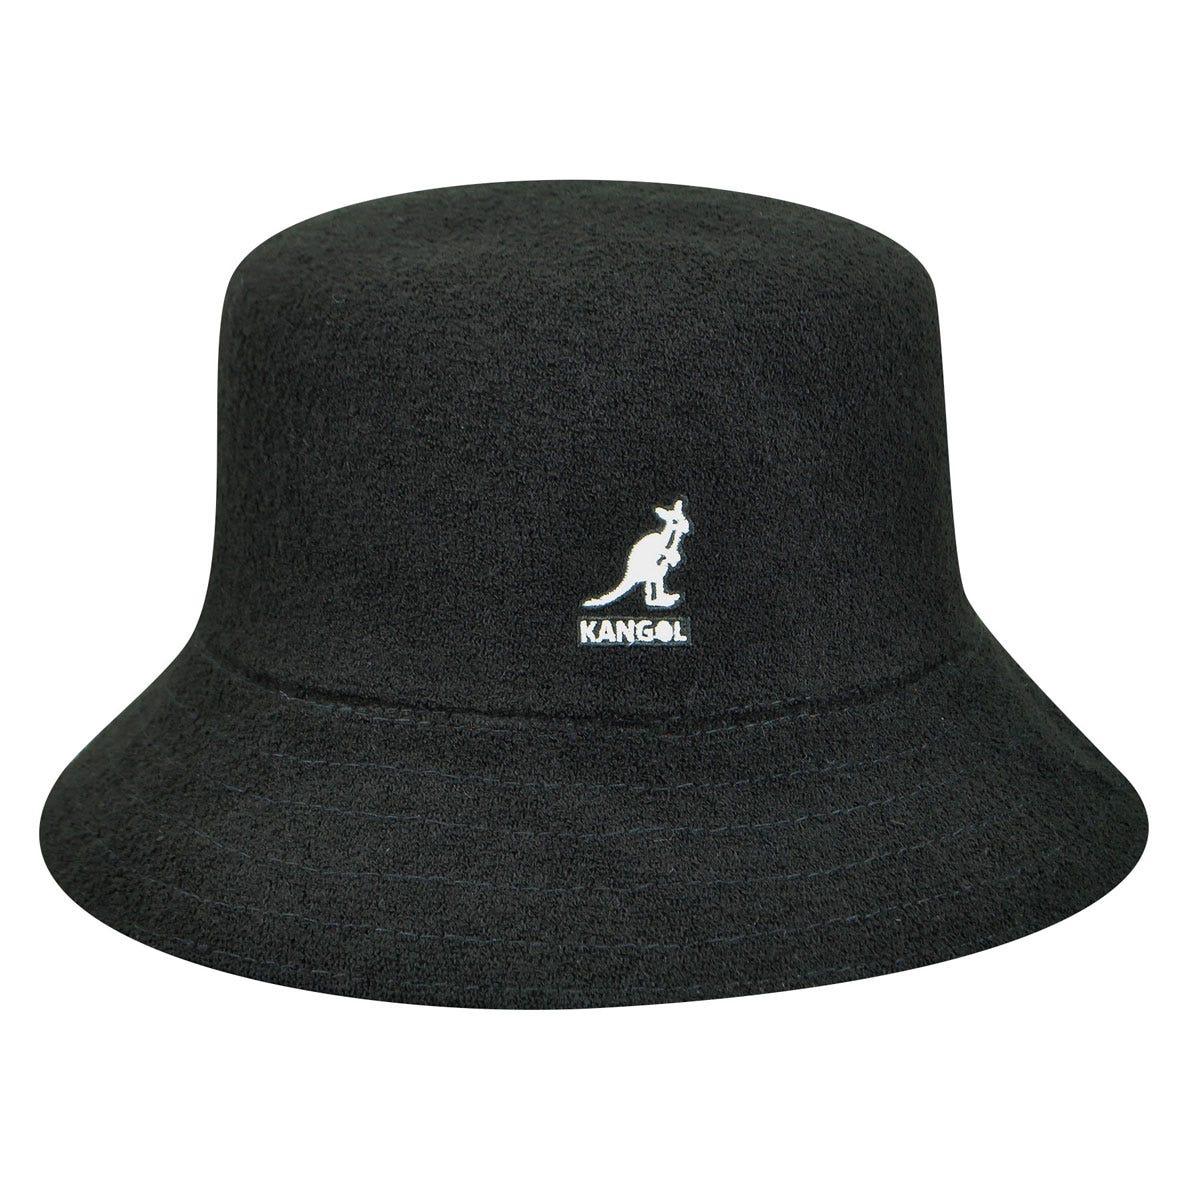 Kangol Bermuda Bucket Black